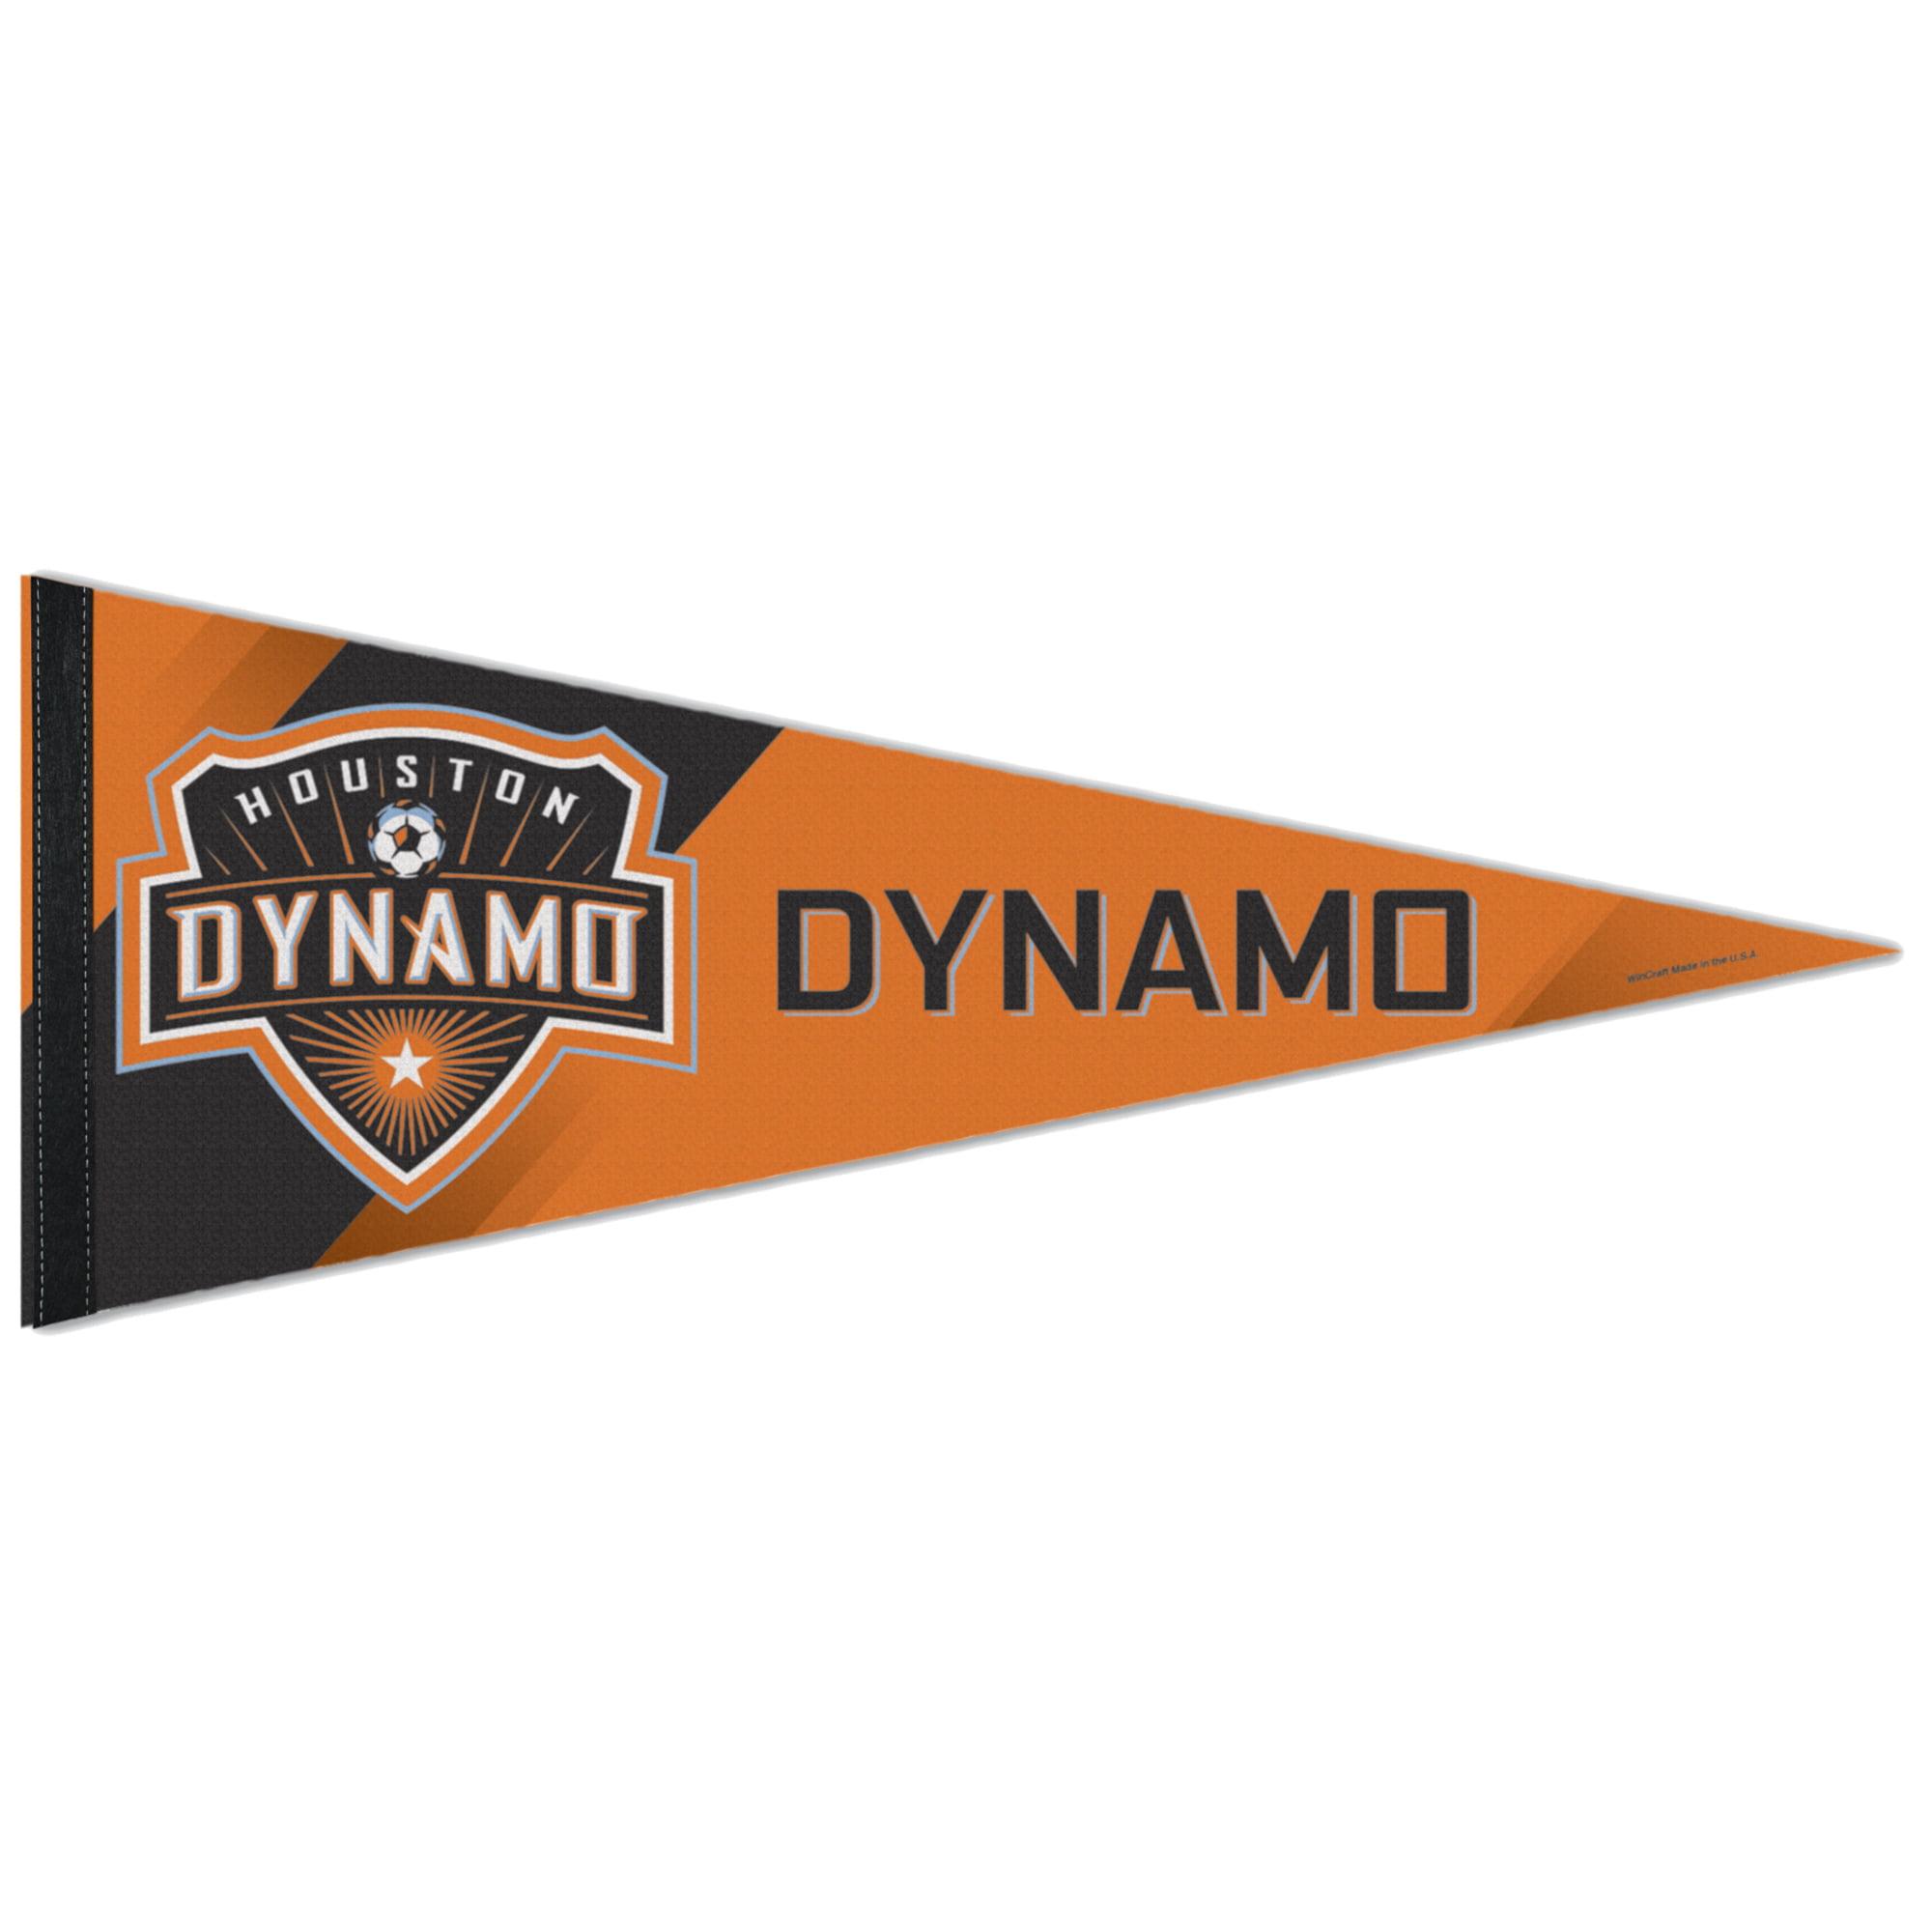 "Houston Dynamo WinCraft 12"" x 30"" Premium Pennant - No Size"